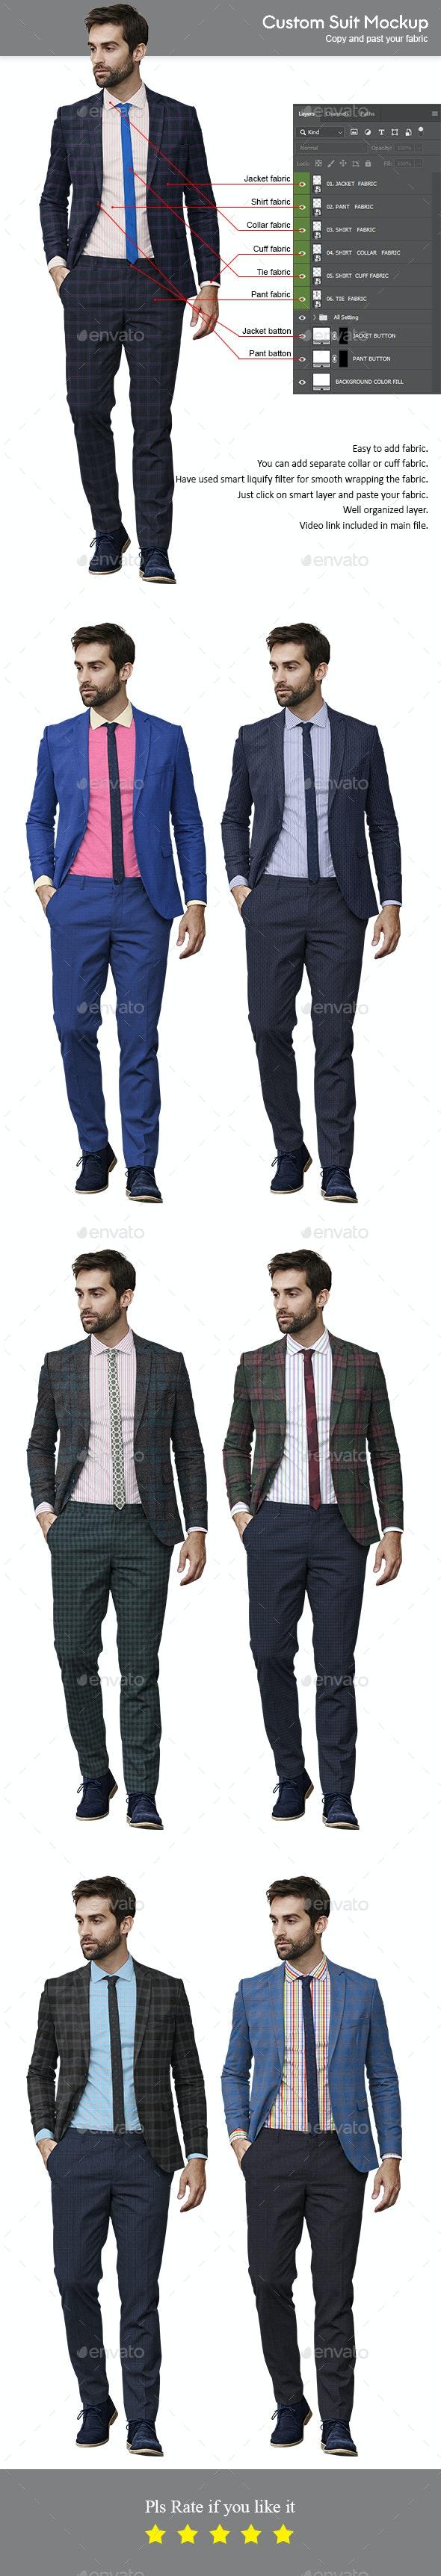 Custom Suit Mockup - Apparel Product Mock-Ups